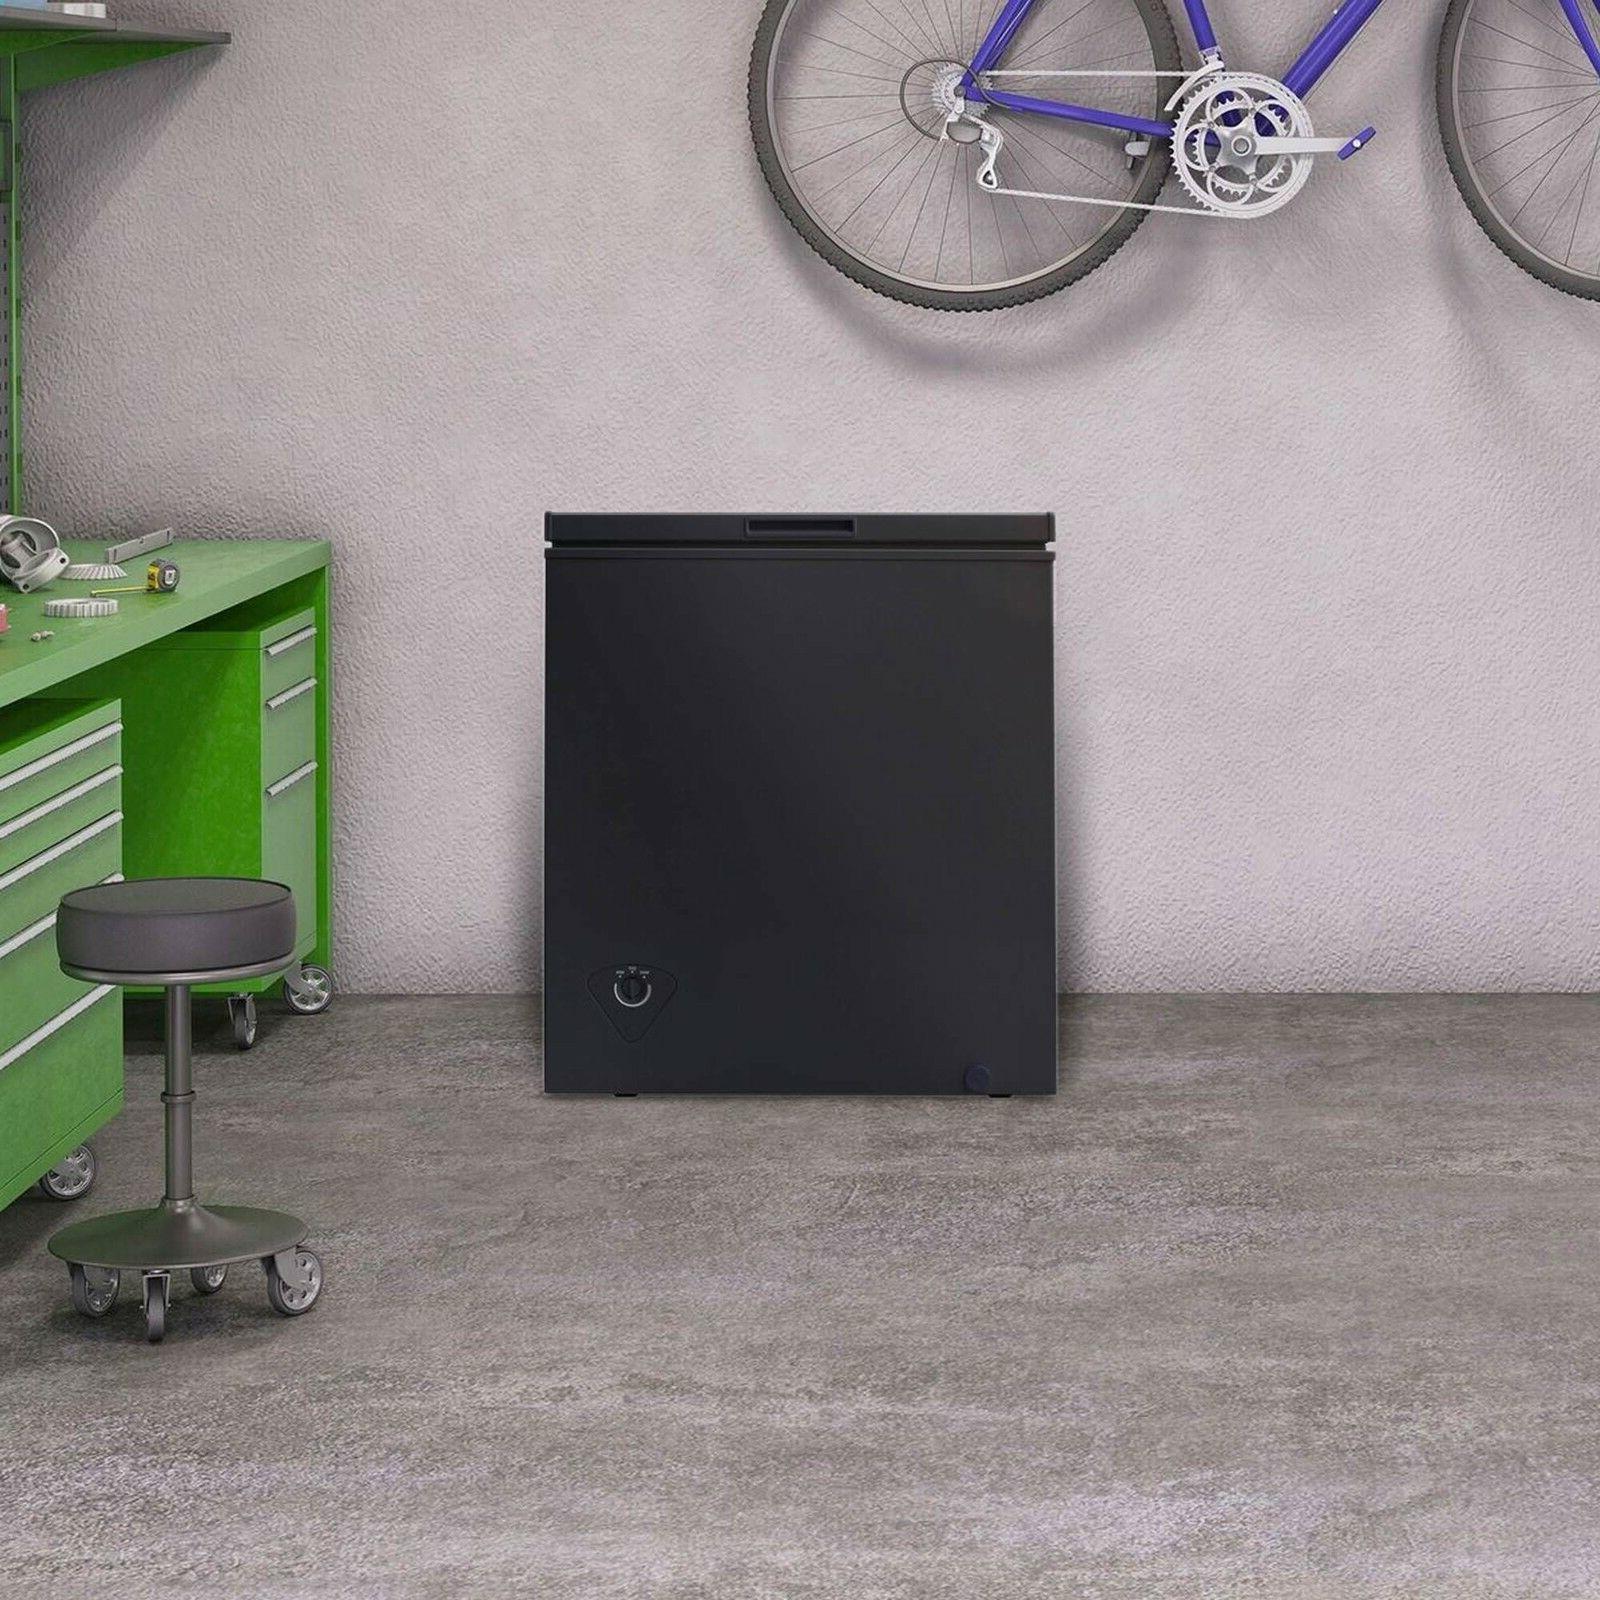 Chest Freezer Storage cu ft Energy Compact